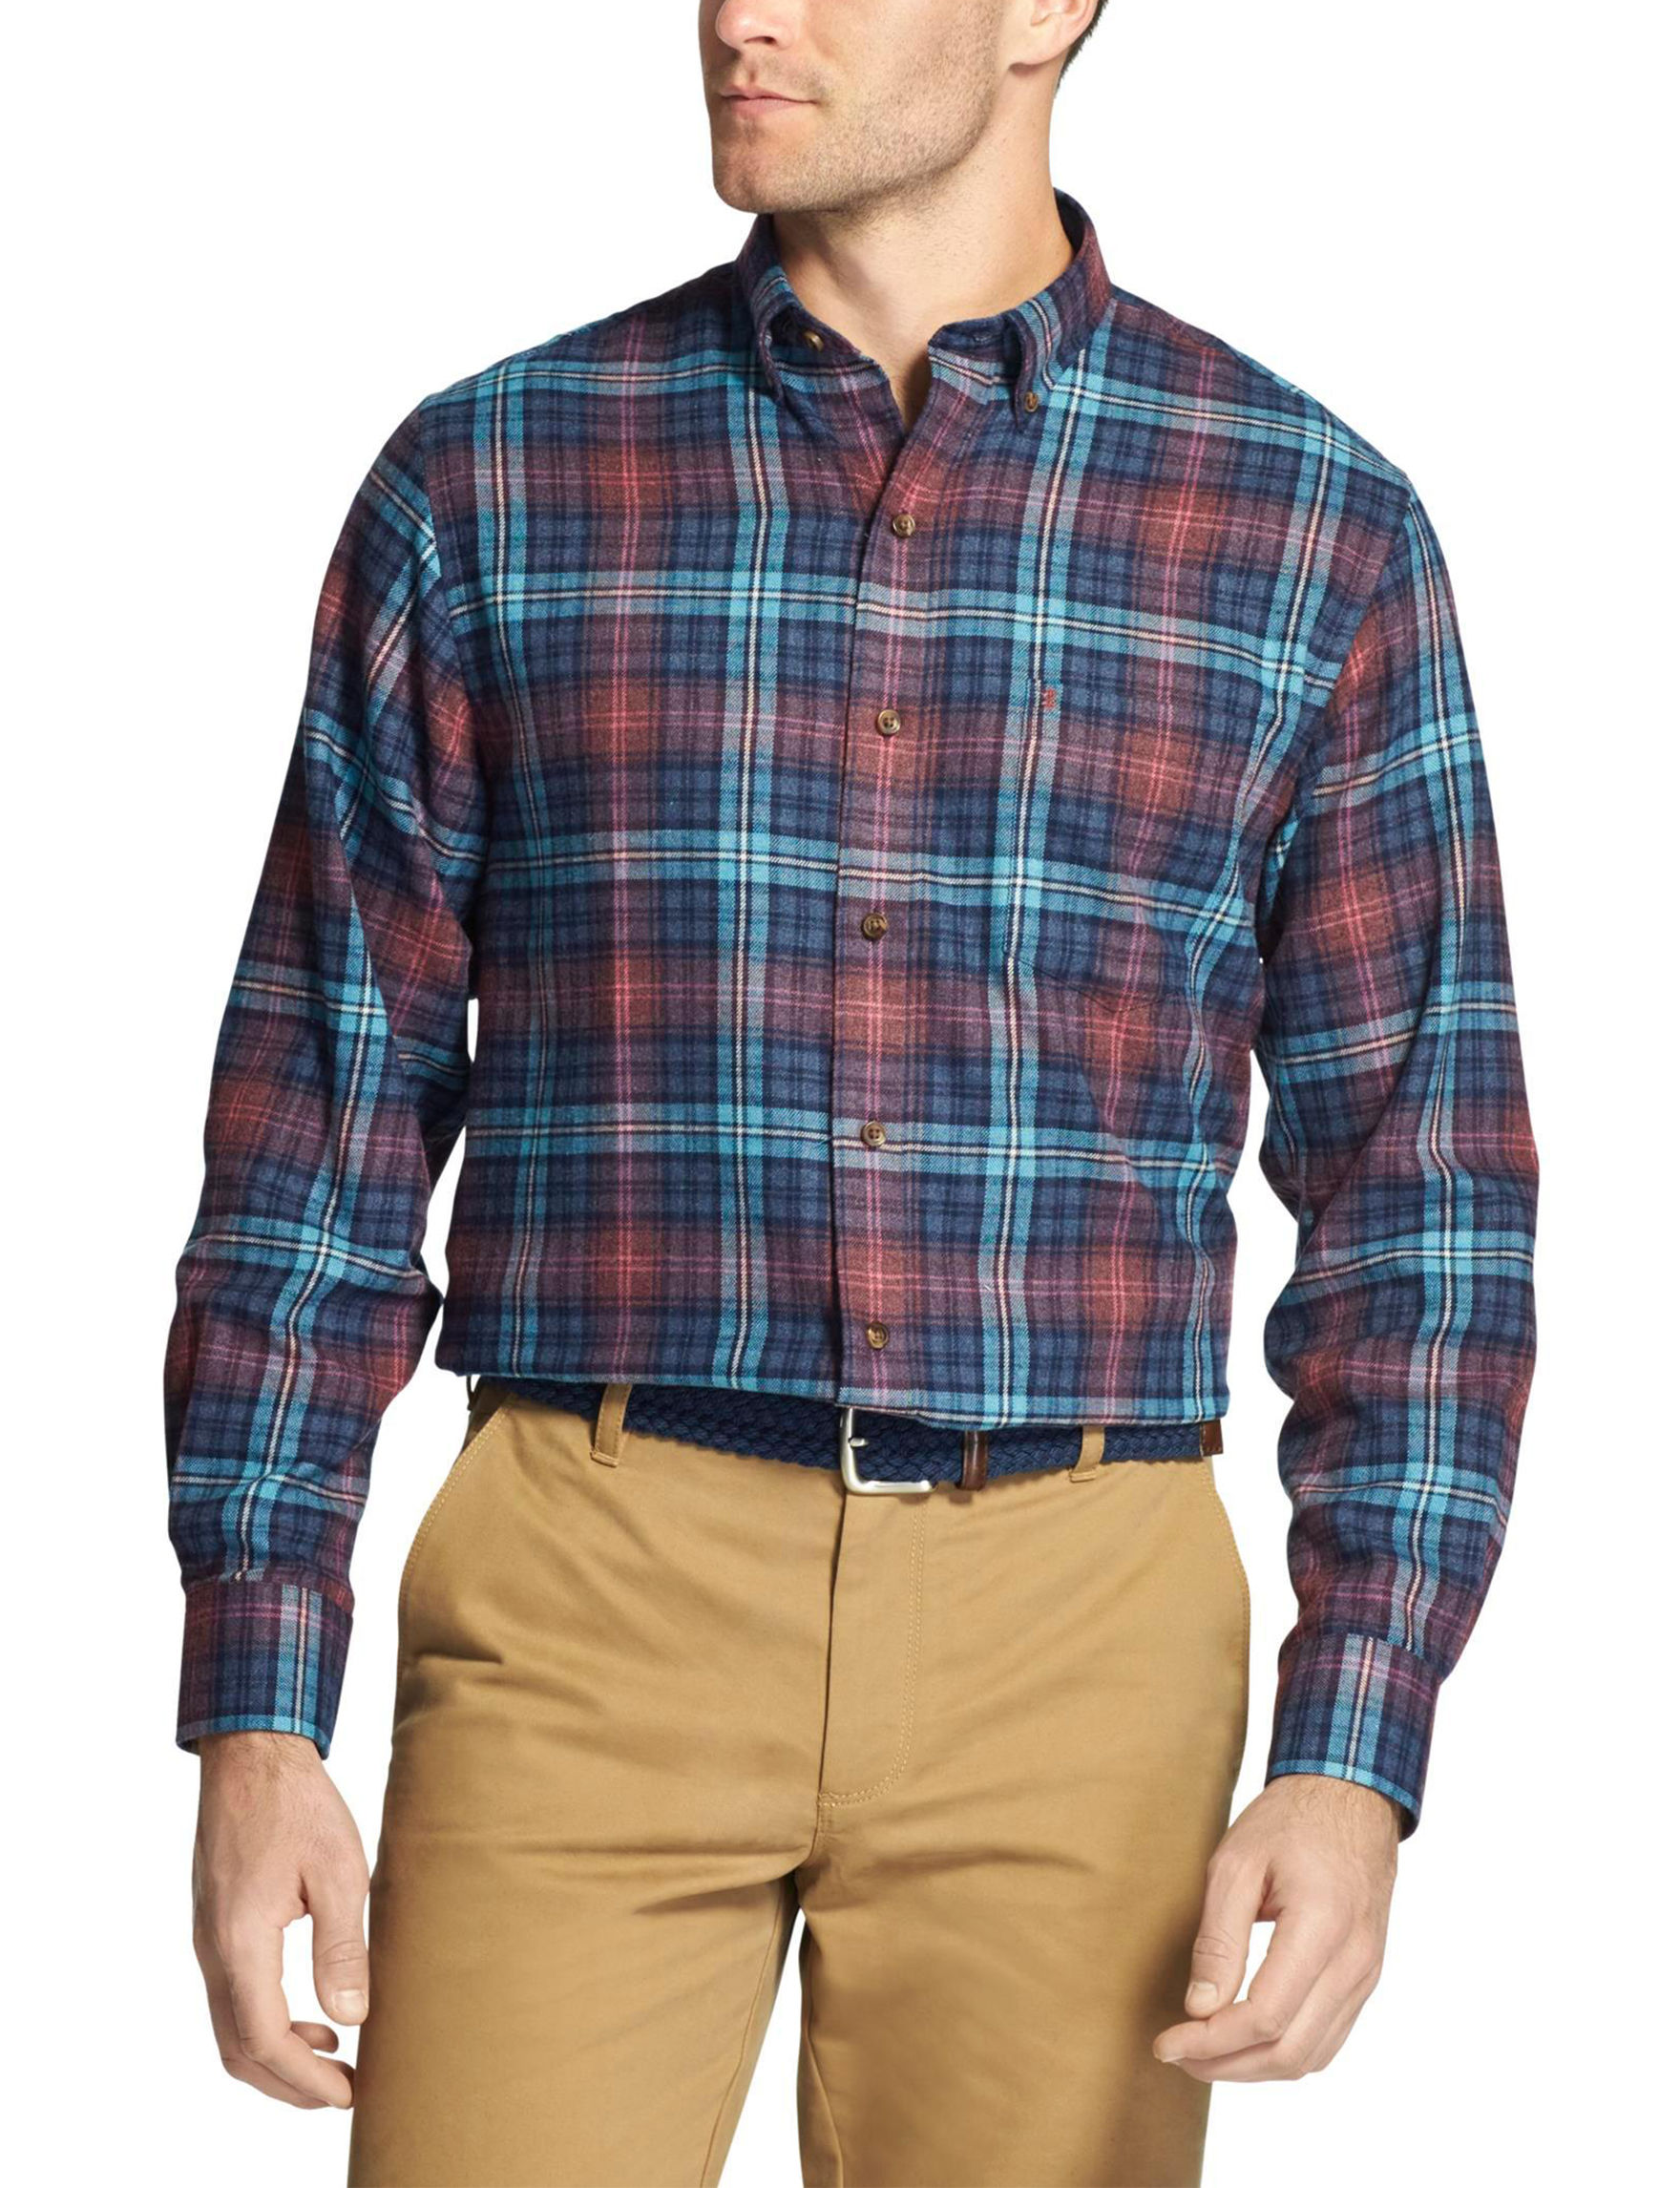 Izod Navy Plaid Casual Button Down Shirts